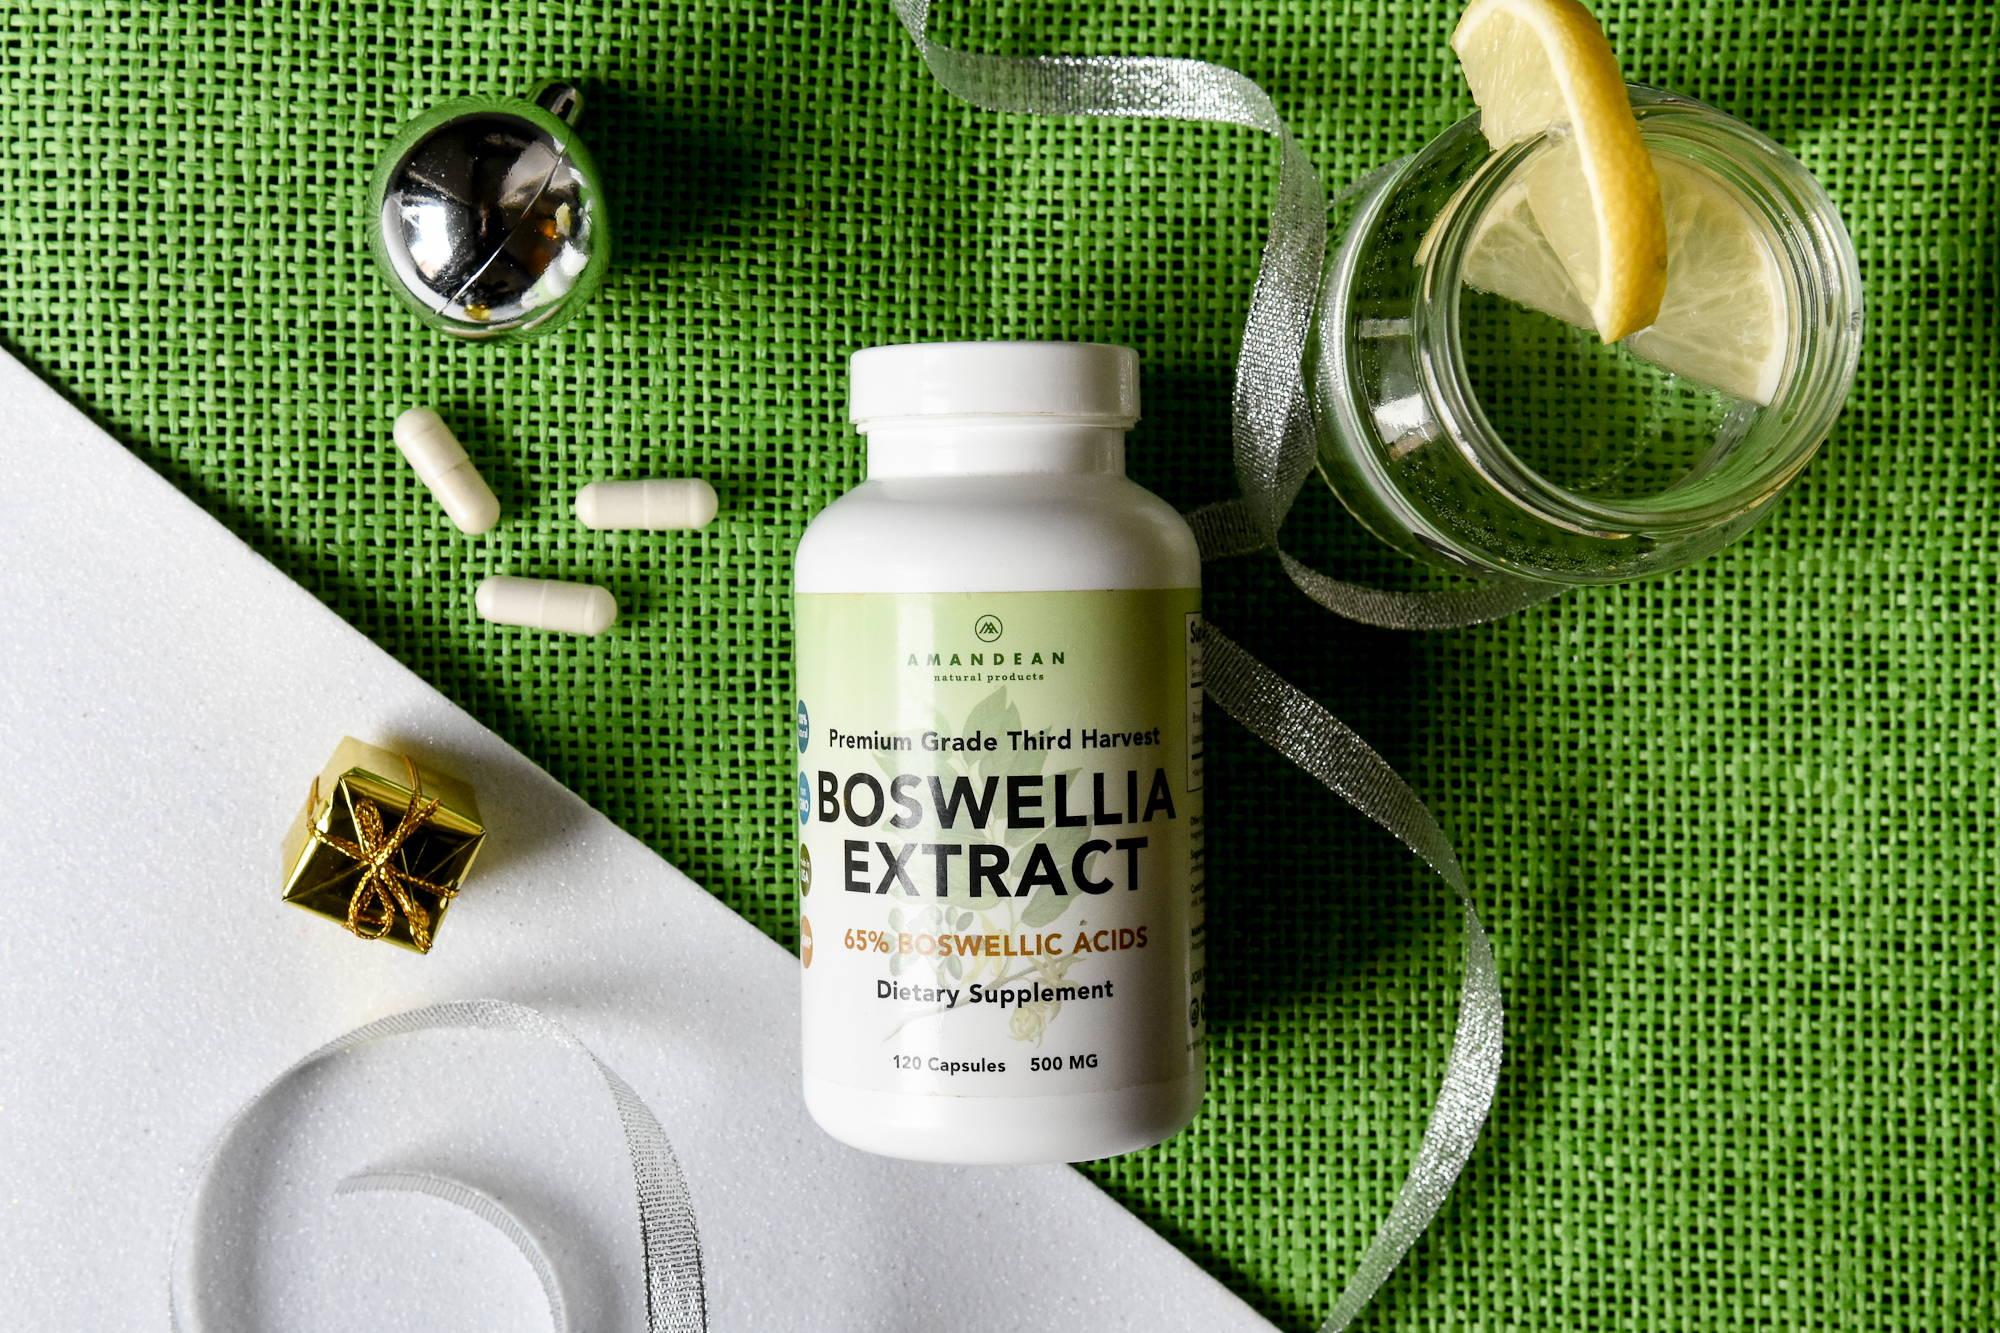 Manage Your Mood With Premium Boswellia Serrata Extract